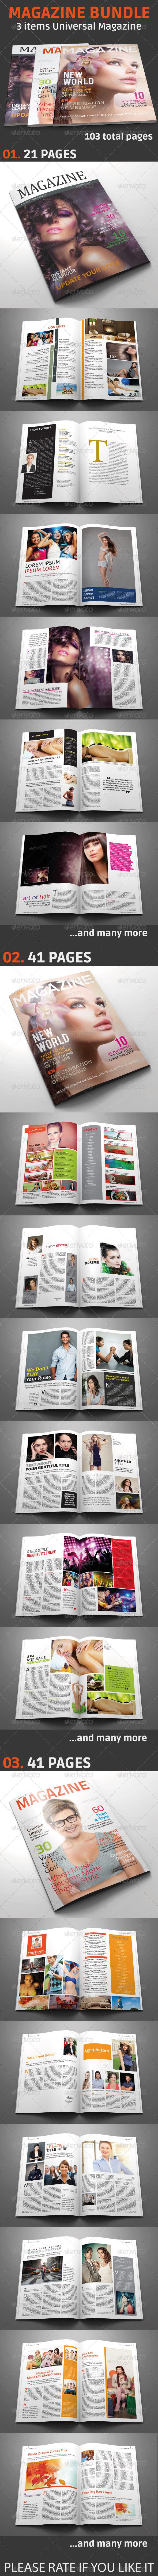 GraphicRiver Magazine Bundle Vol.01 5283869